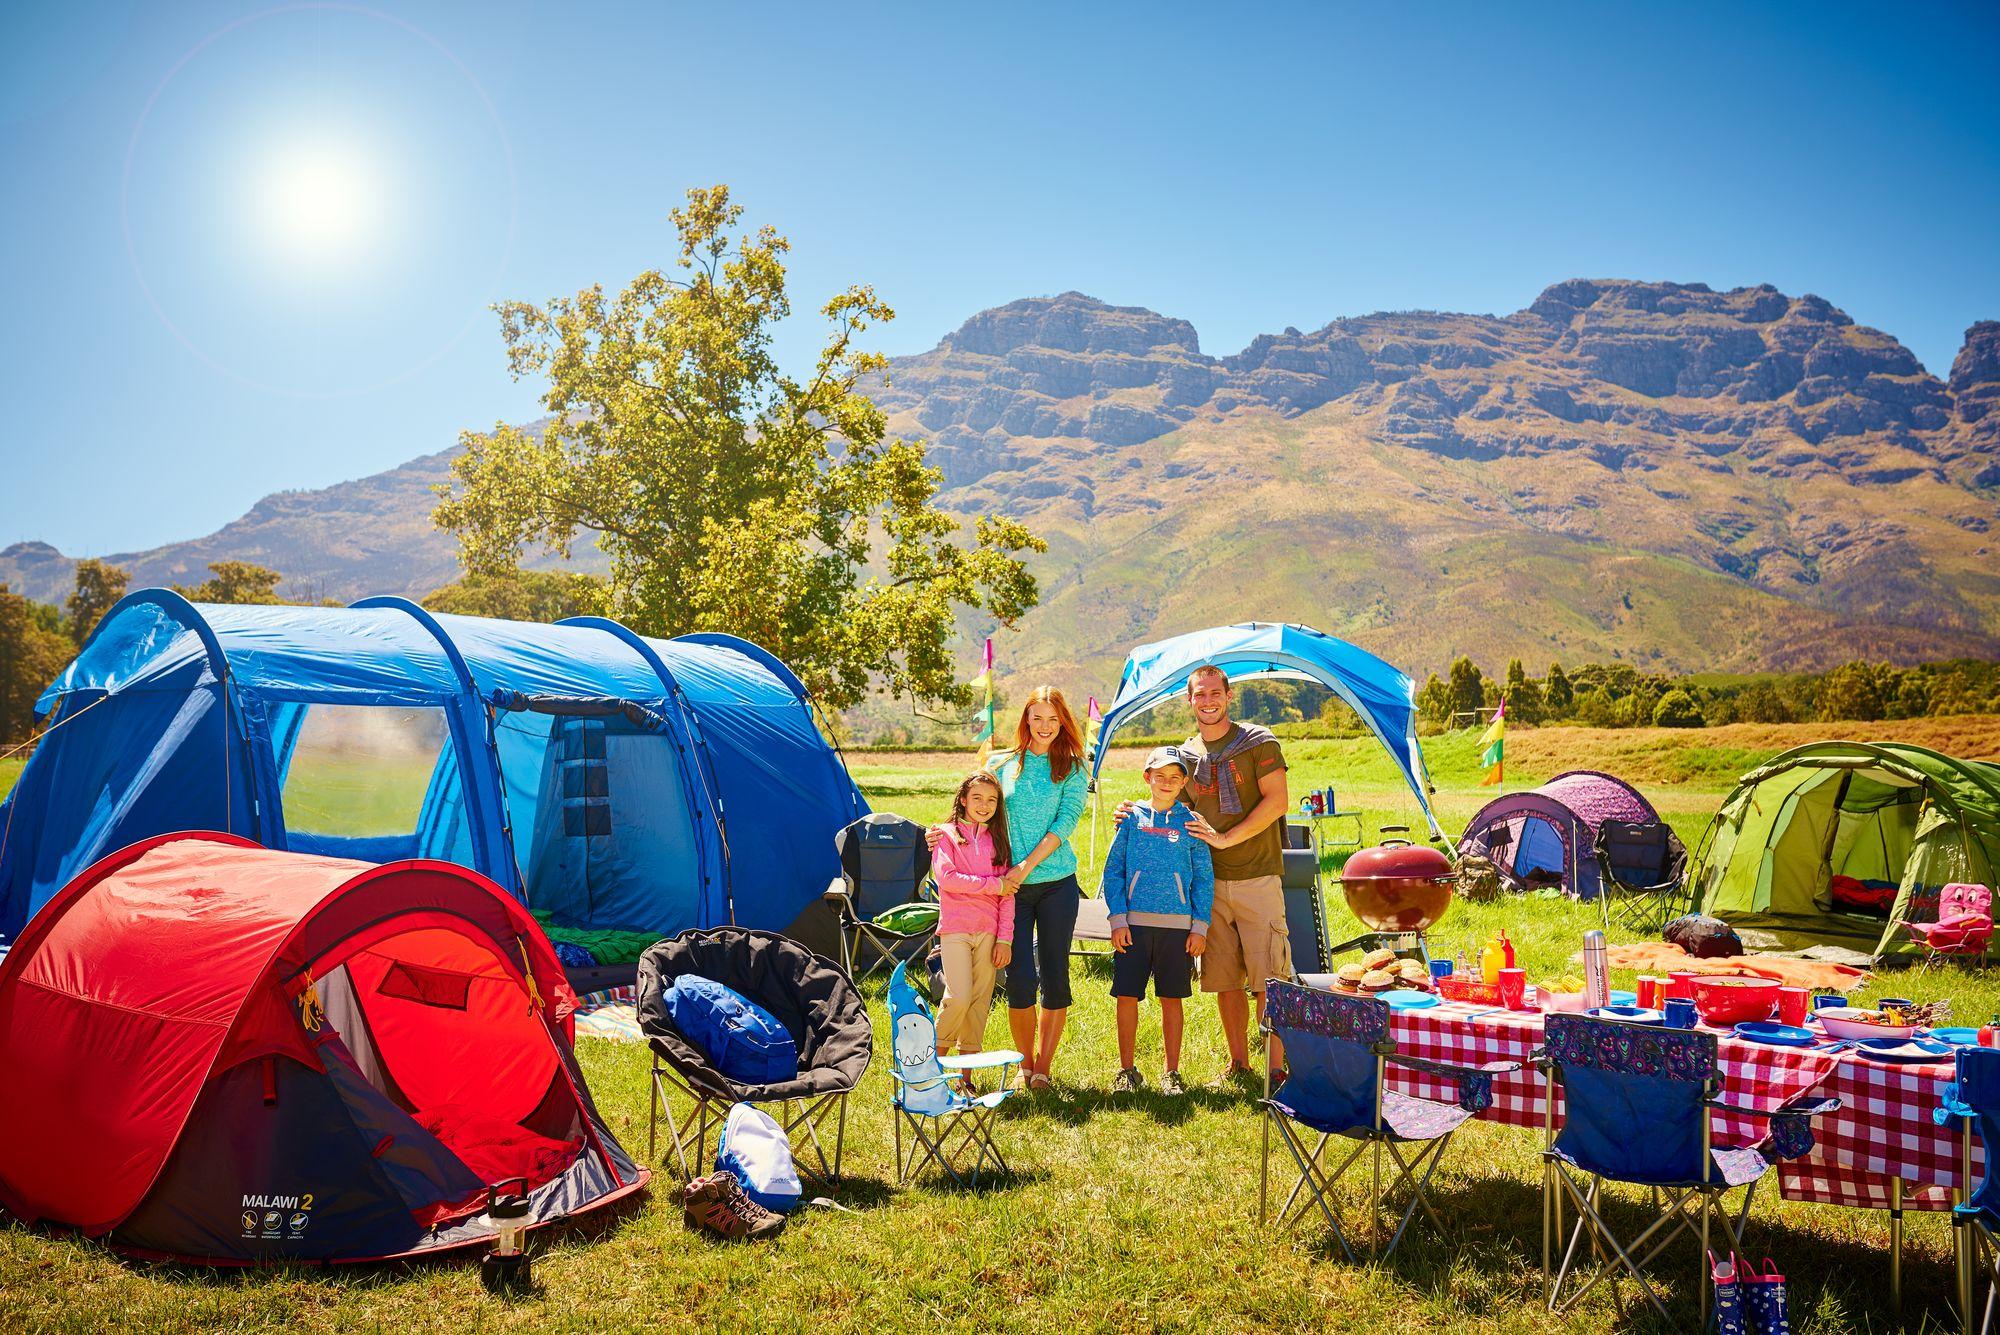 camping essentials header image